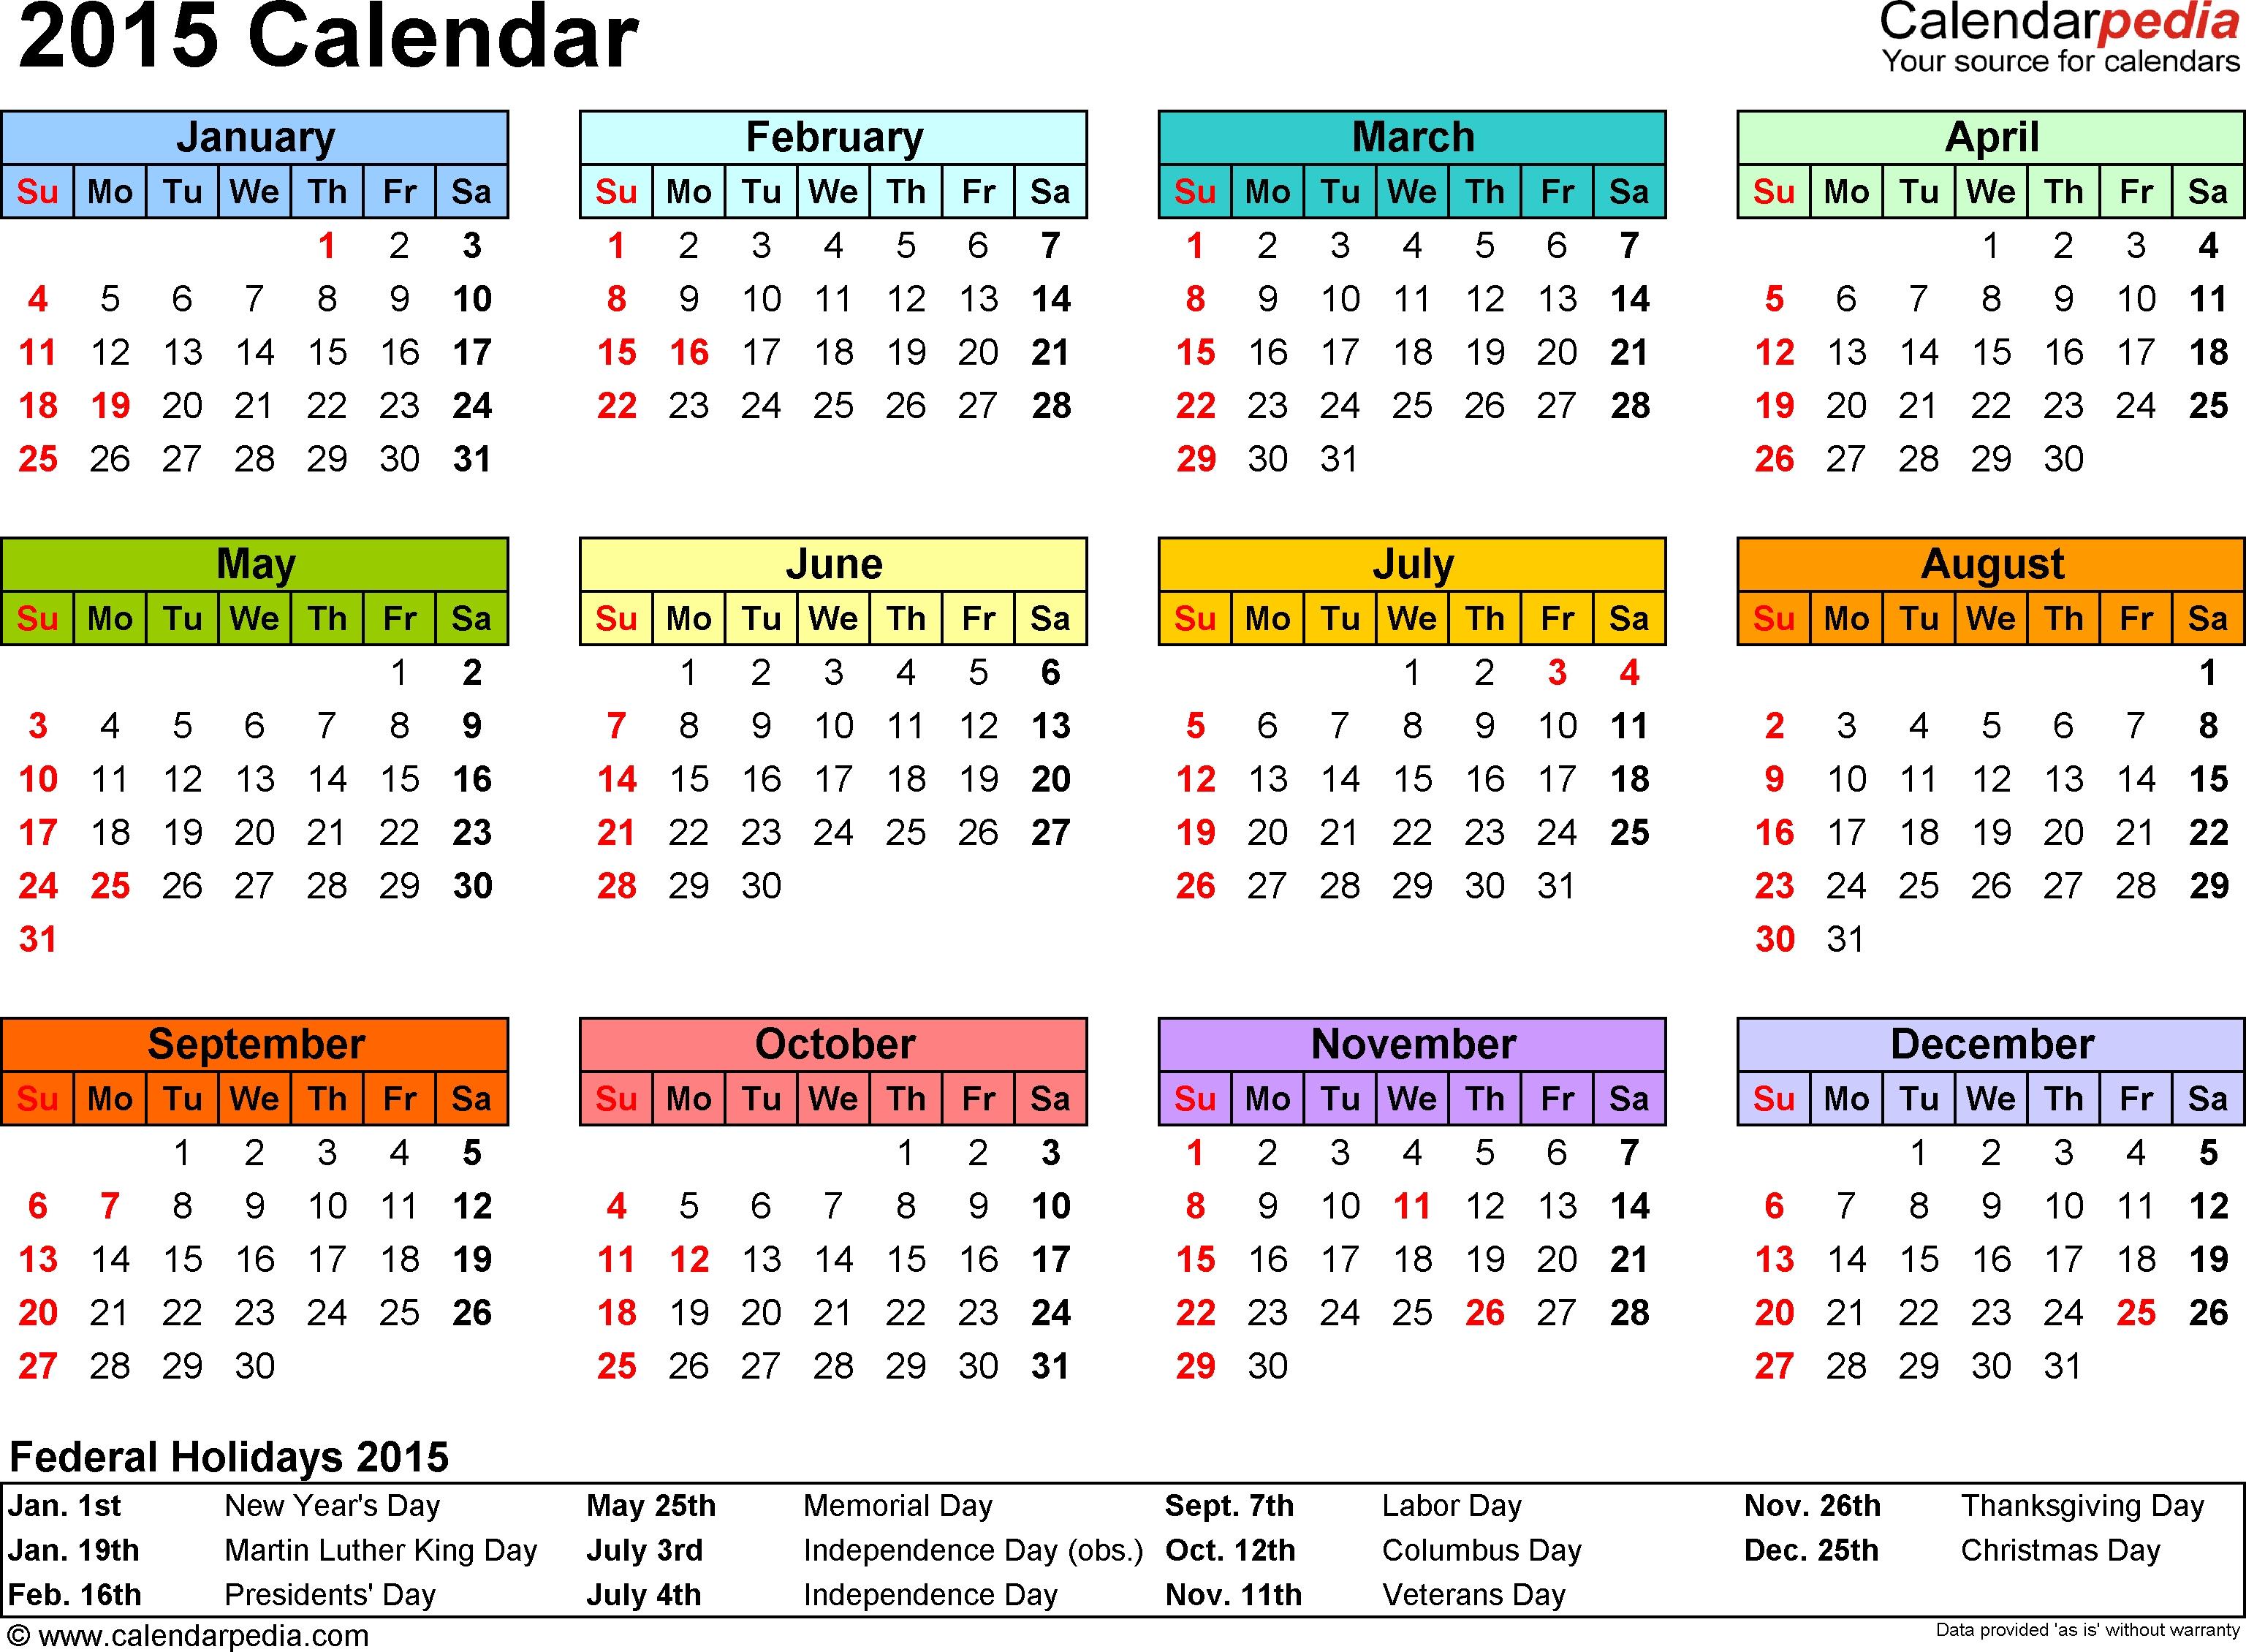 Printable Calendars 2015 Landscape | Calendar Iphone 5 Youtube